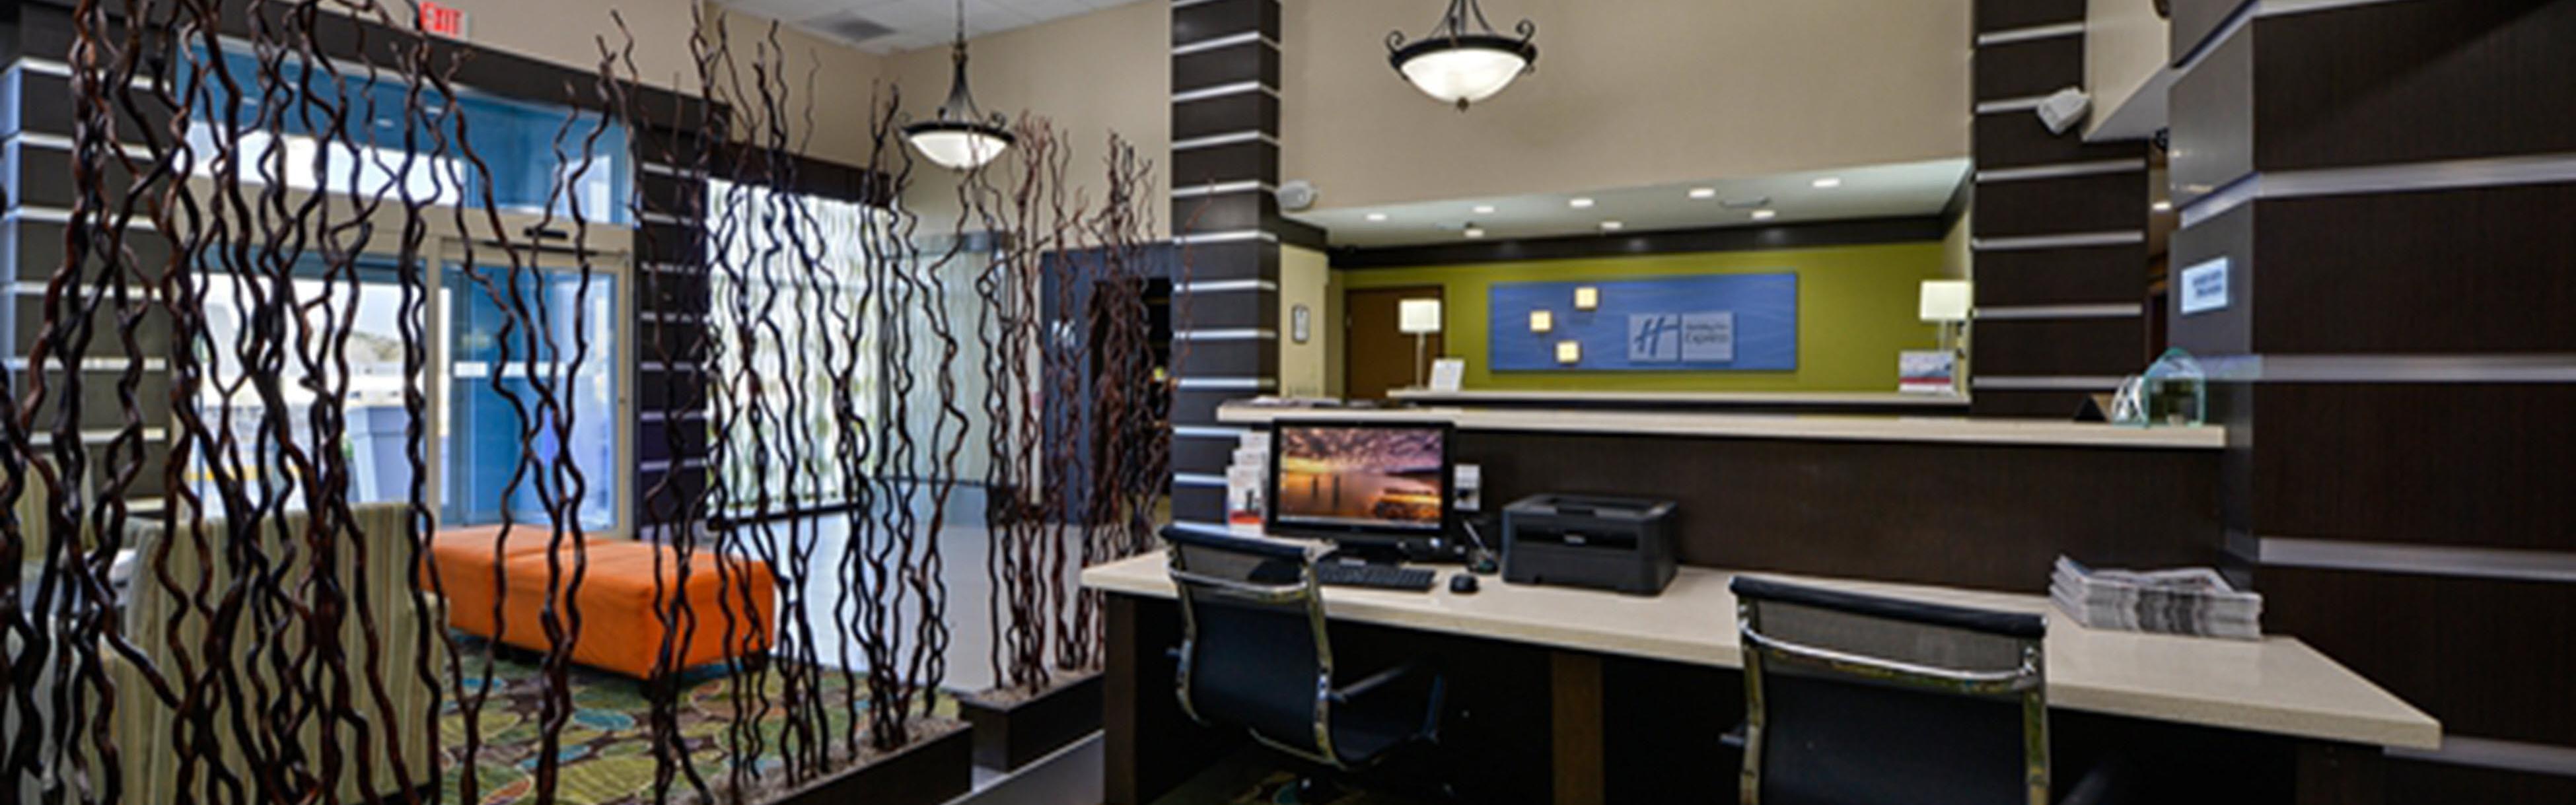 Holiday Inn Express & Suites Kingwood - Medical Center Area image 0